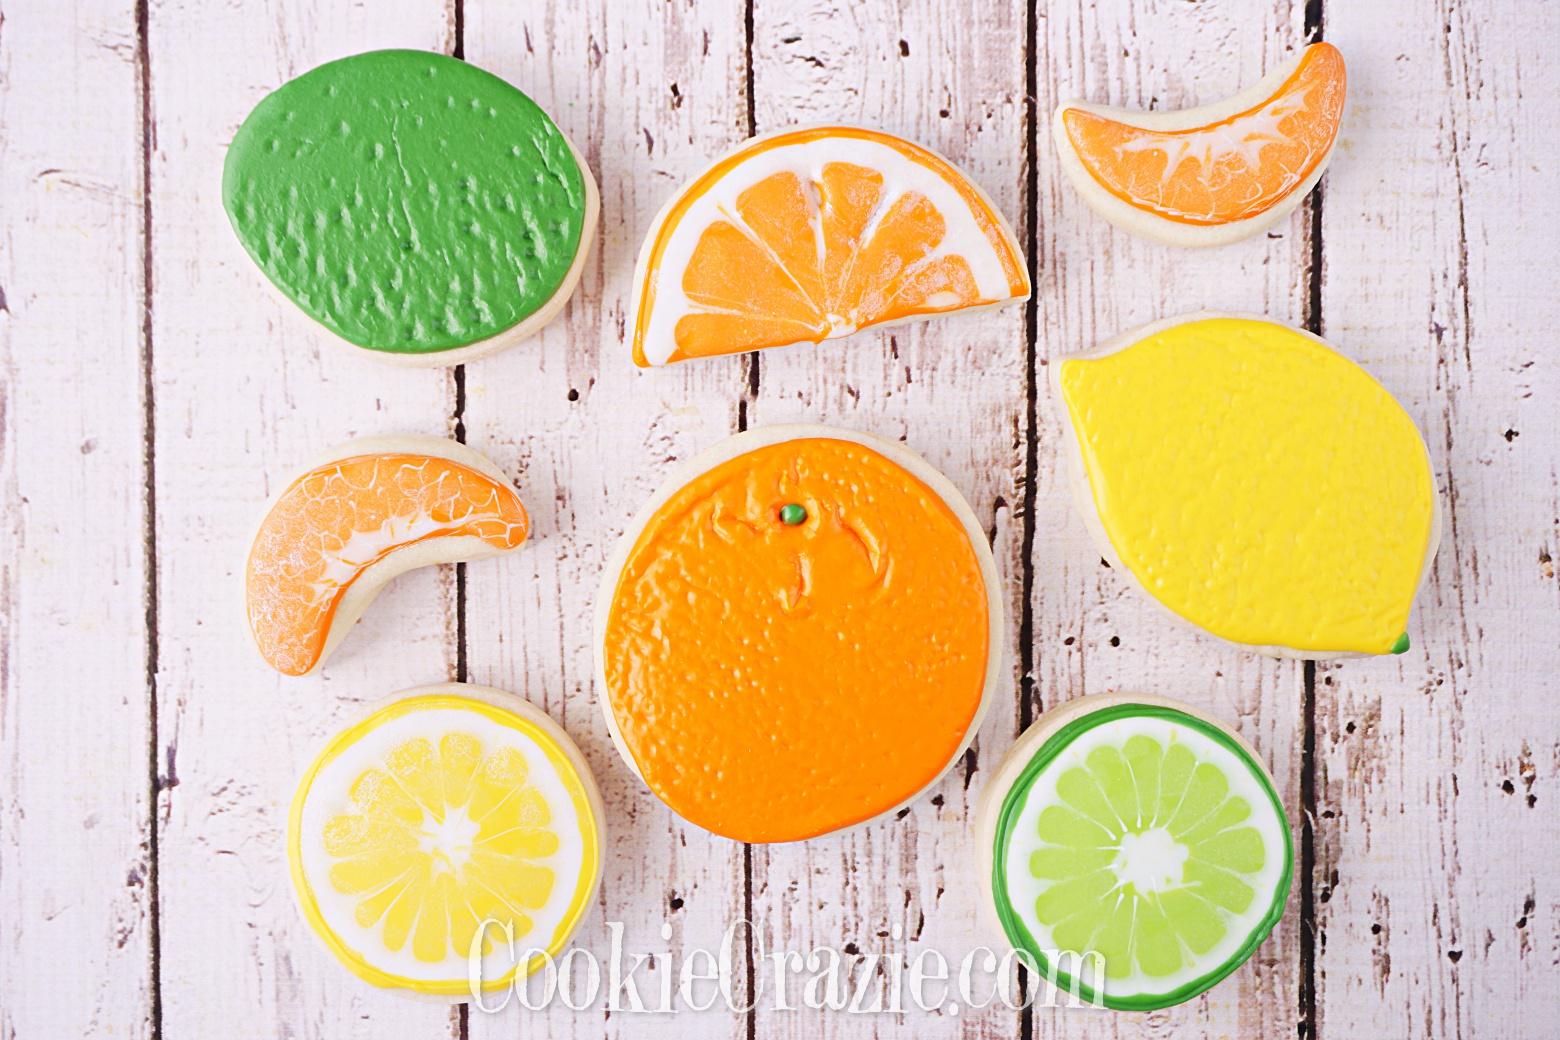 Orange Decorated Sugar Cookies YouTube video  HERE